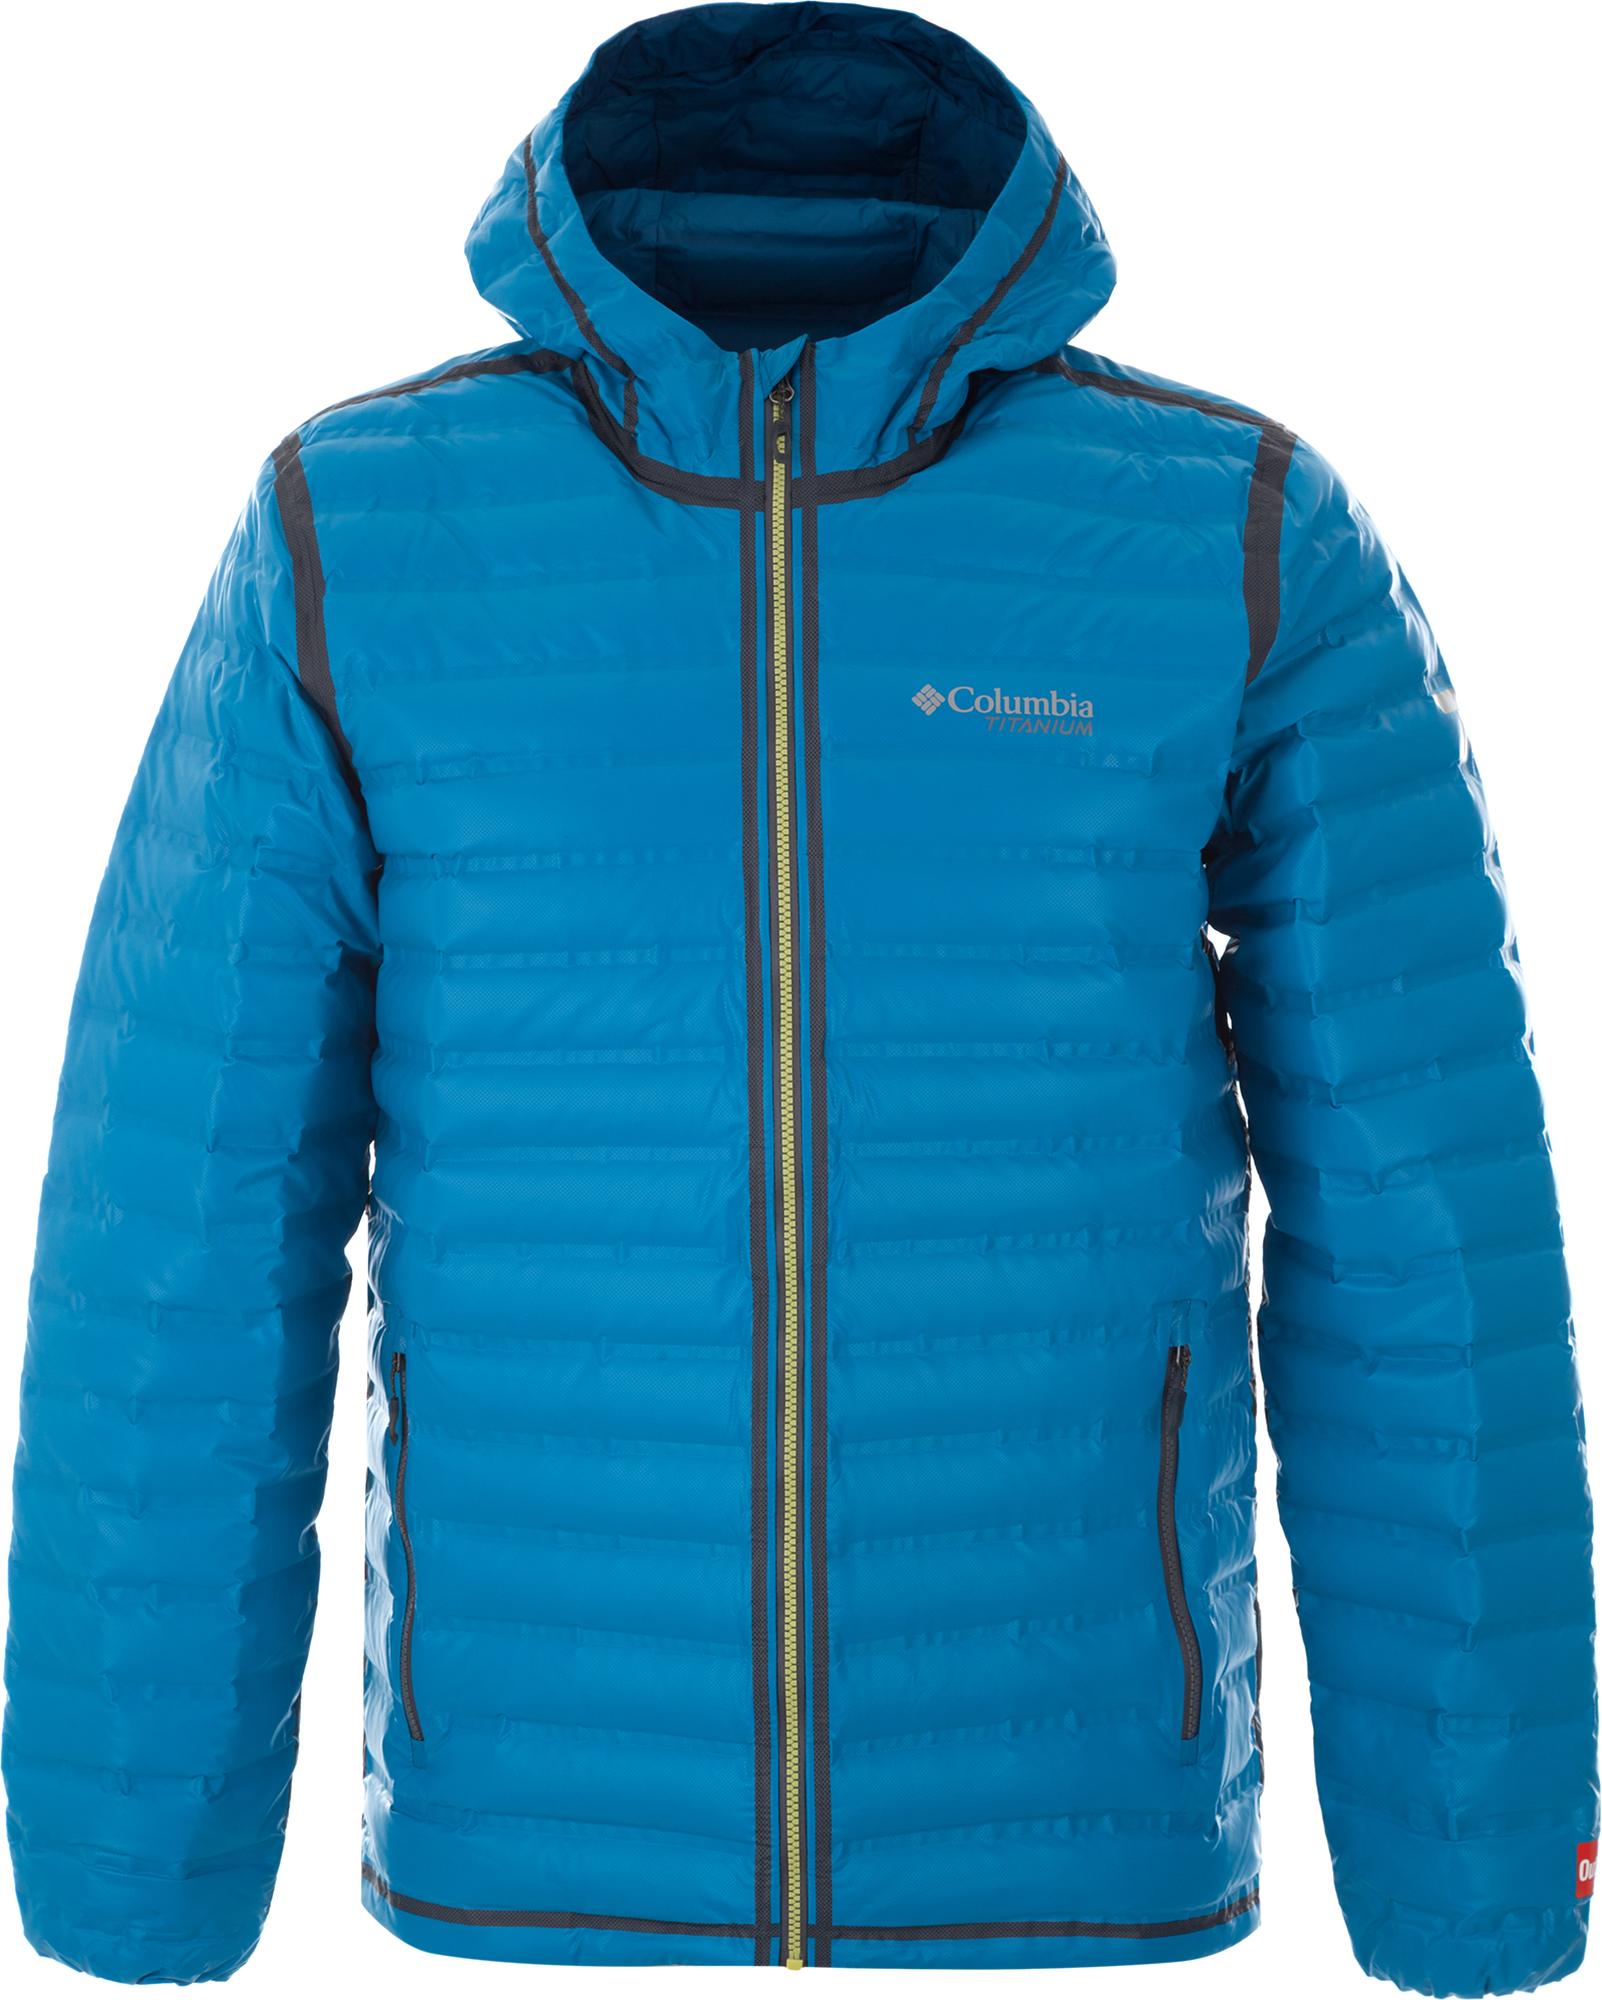 Columbia Куртка пуховая мужская Columbia OutDry, размер 48-50 columbia куртка 3 в 1 мужская columbia whirlibird размер 48 50